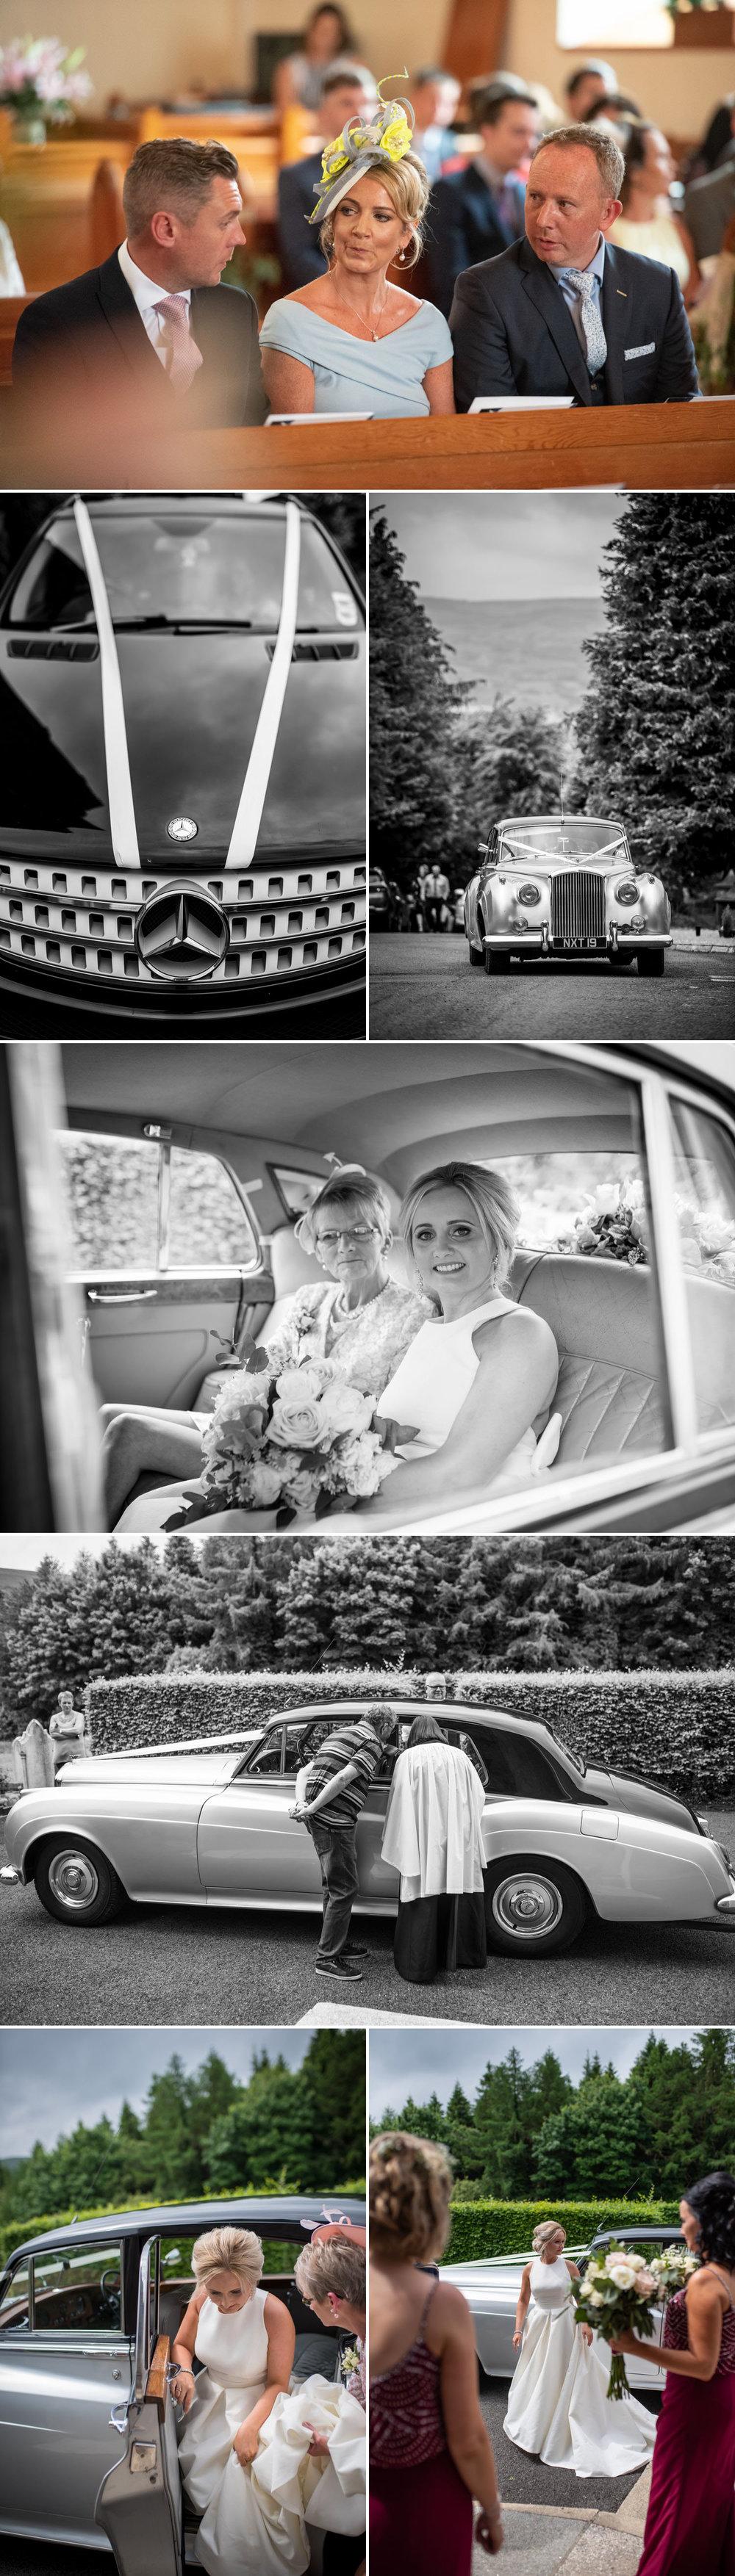 best wedding photographers northern ireland 05.jpg